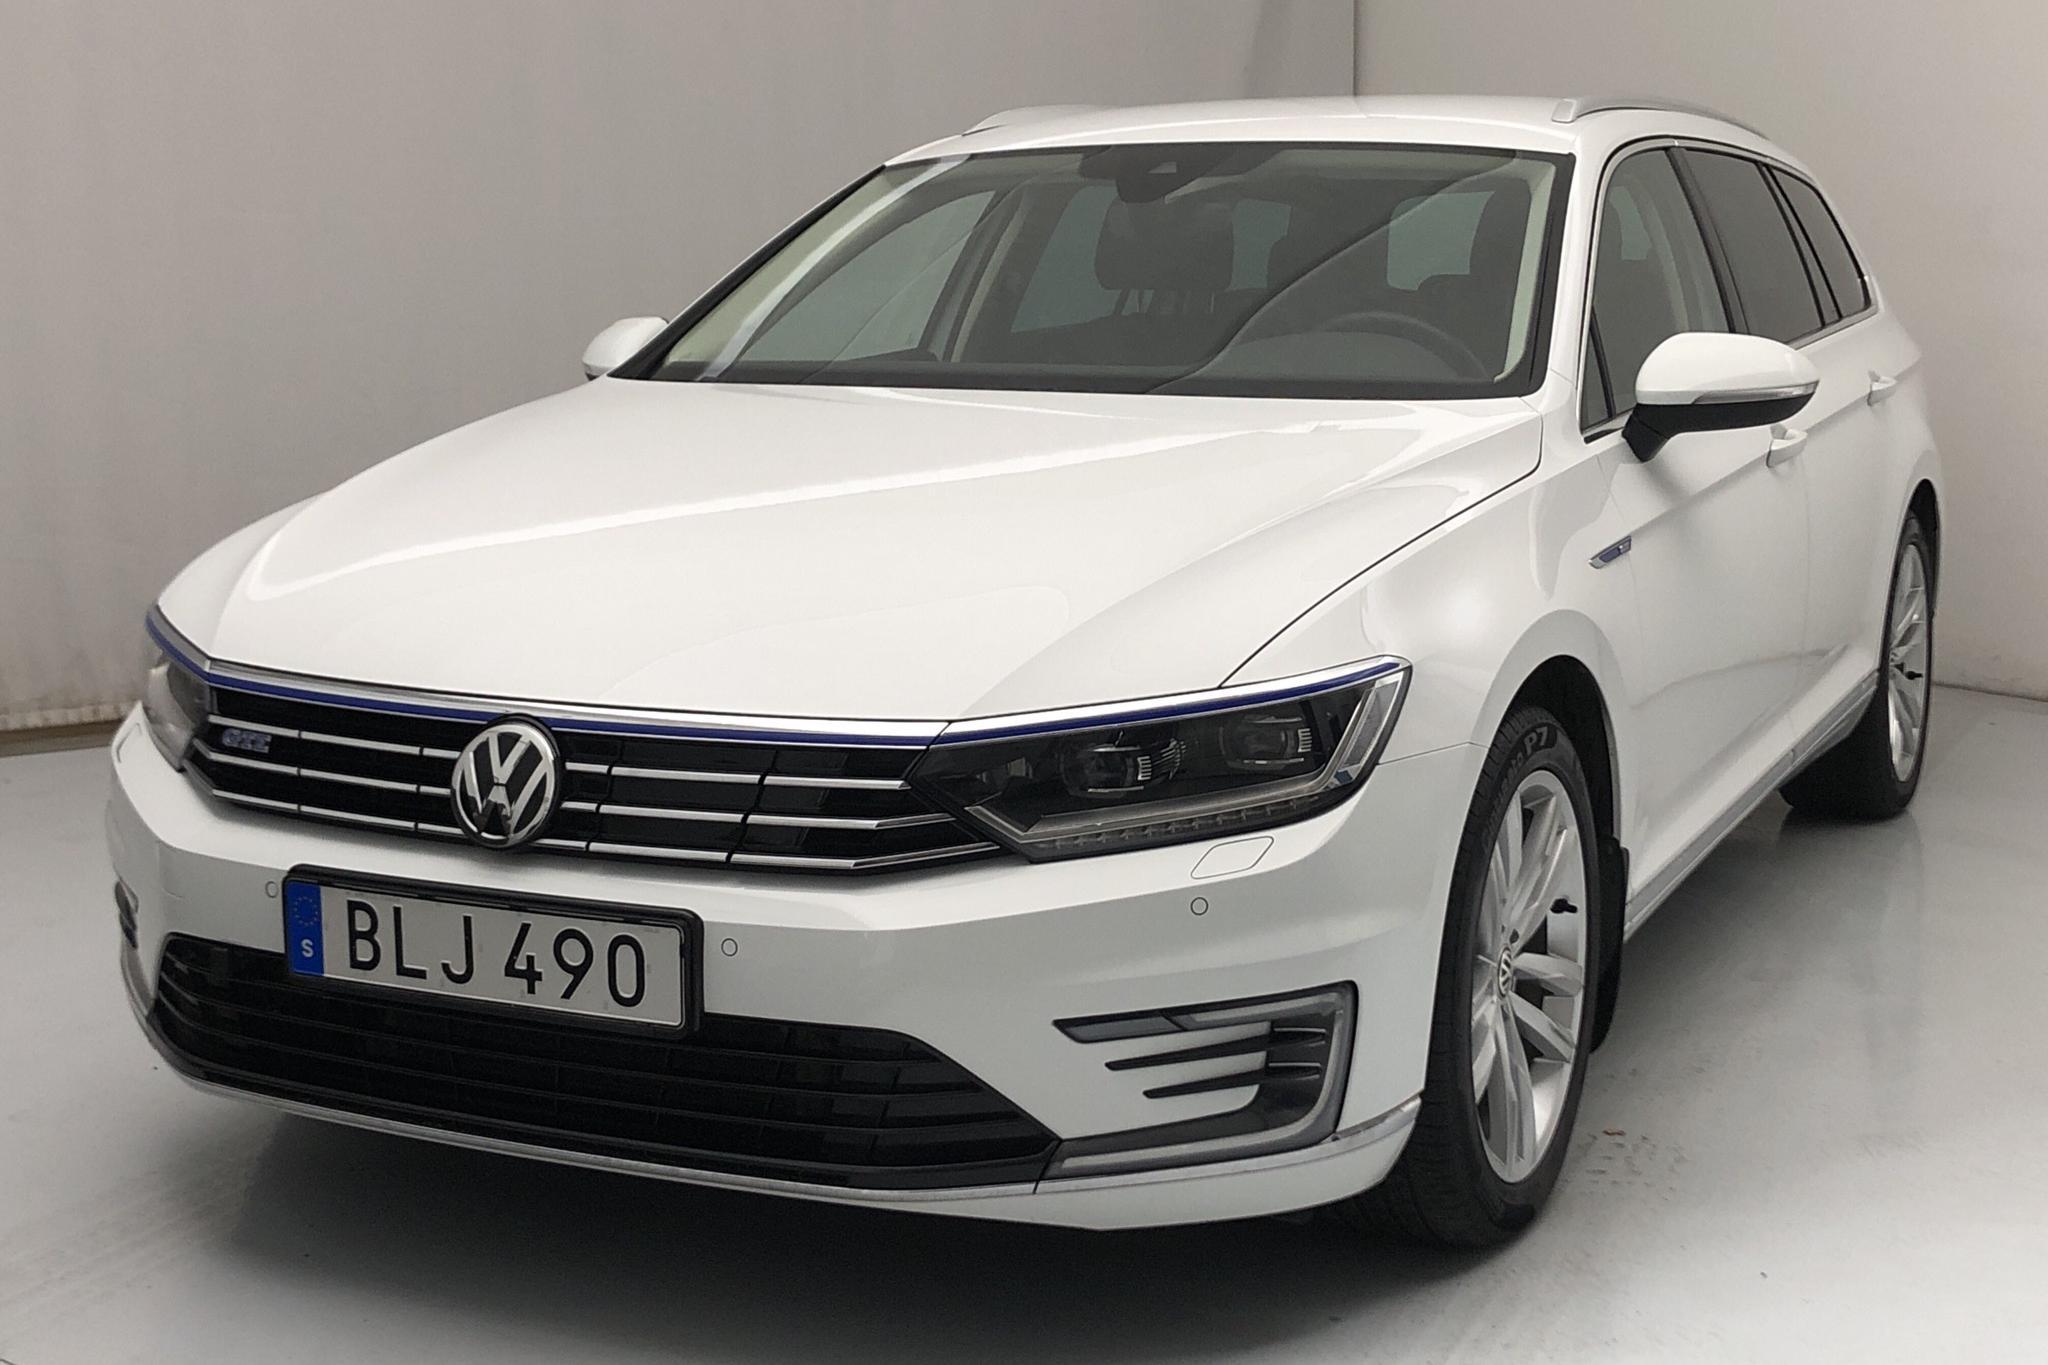 VW Passat 1.4 Plug-in-Hybrid Sportscombi (218hk) - 78 610 km - Automatic - white - 2018